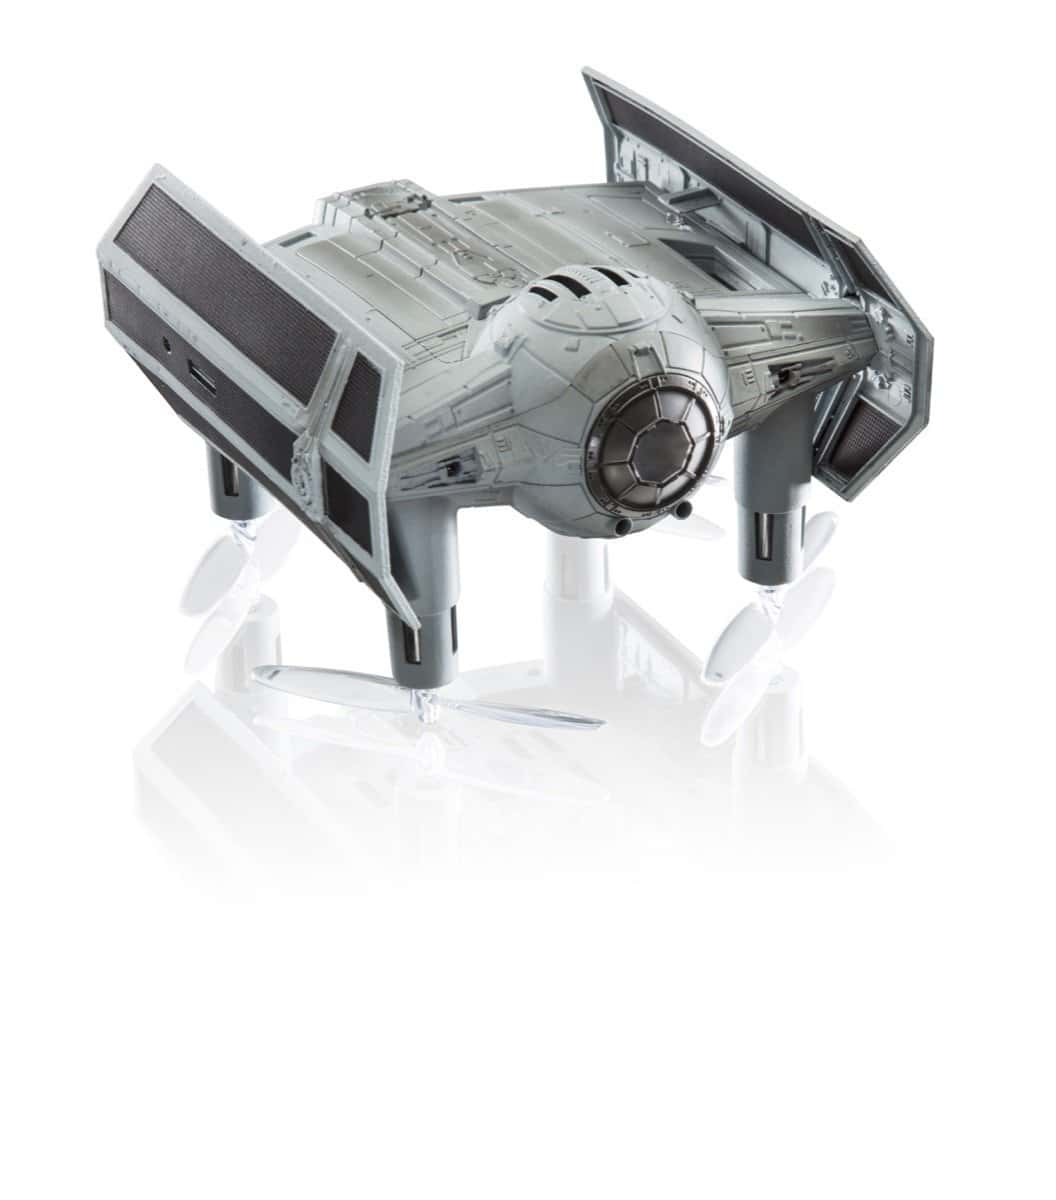 Star Wars Battle Tie-Fighter Drone